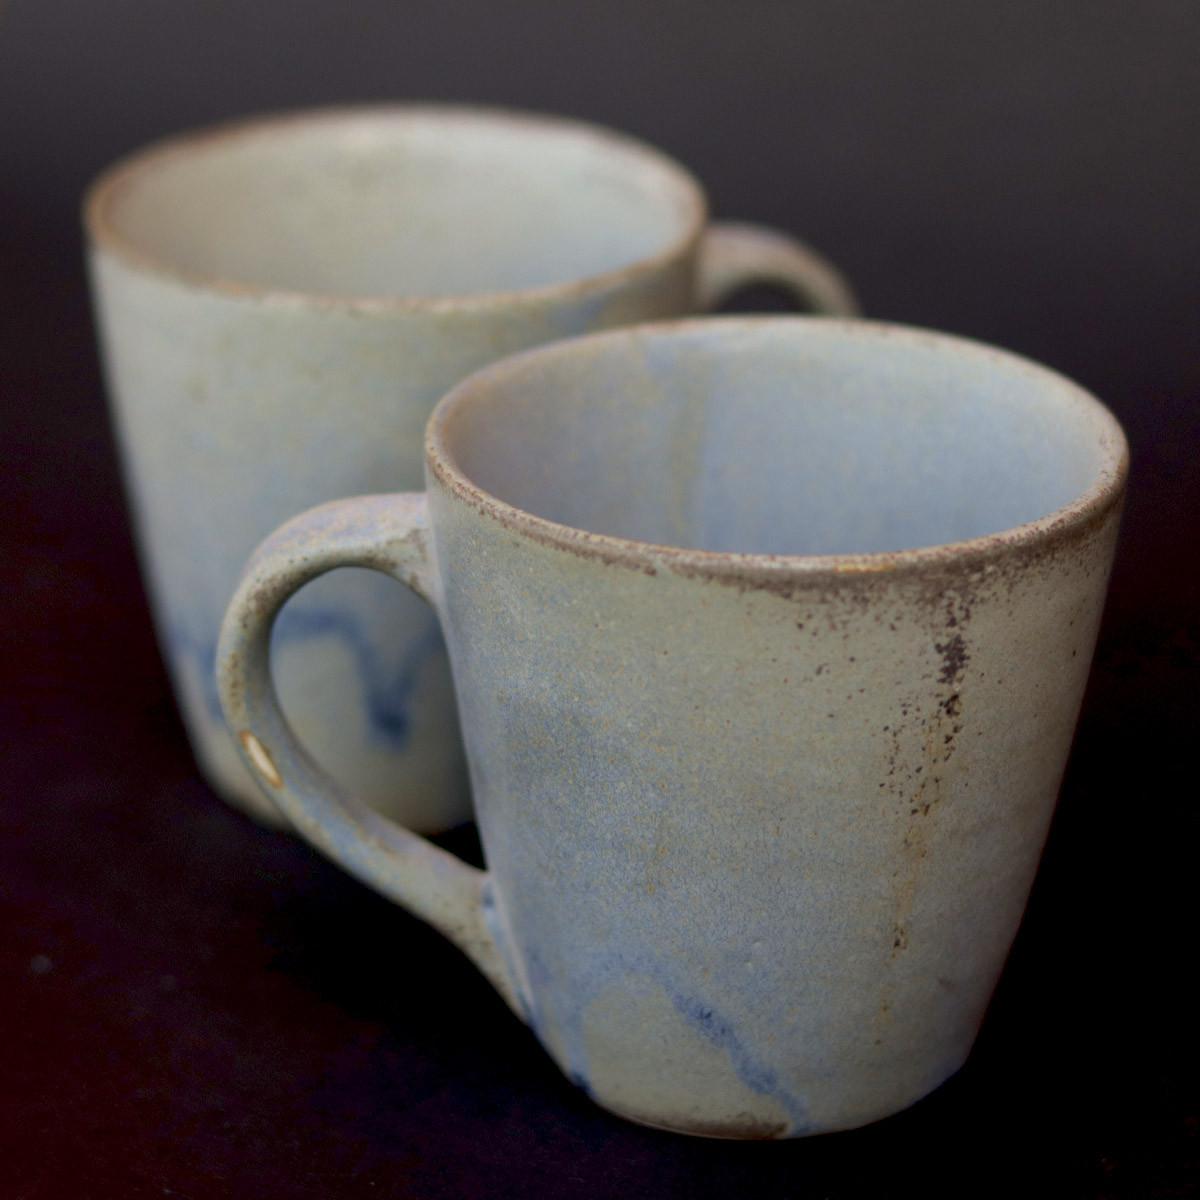 Ceramic Coffee Mugs Set of 2